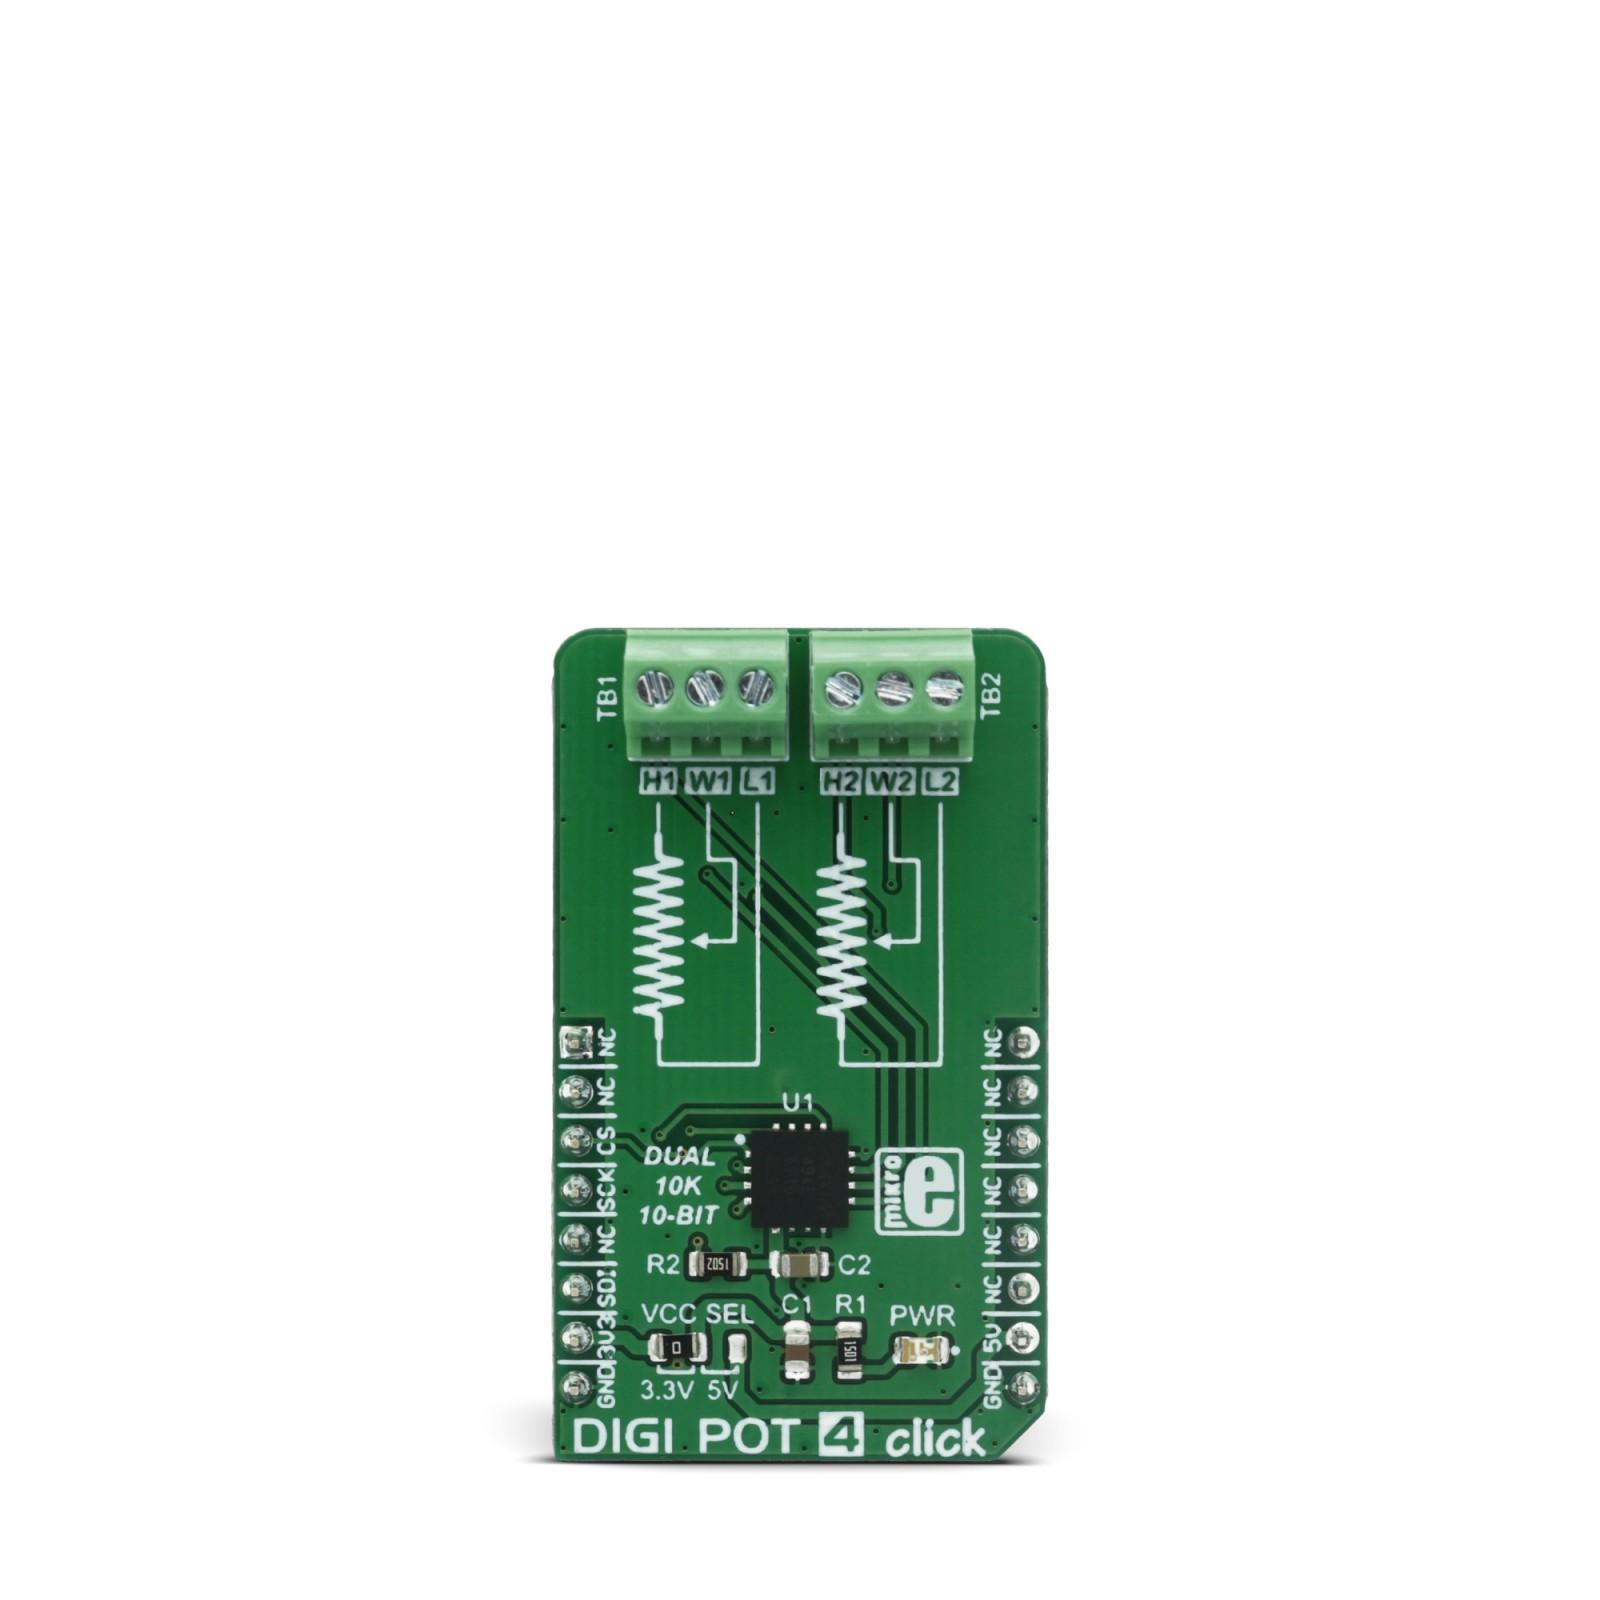 Digi Pot 4 Click 10k Ohm Potentiometer Switch Wiring Diagram Mgctlbxnmzp Mgctlbxv5112 Mgctlbxlc Mgctlbxpprestashop